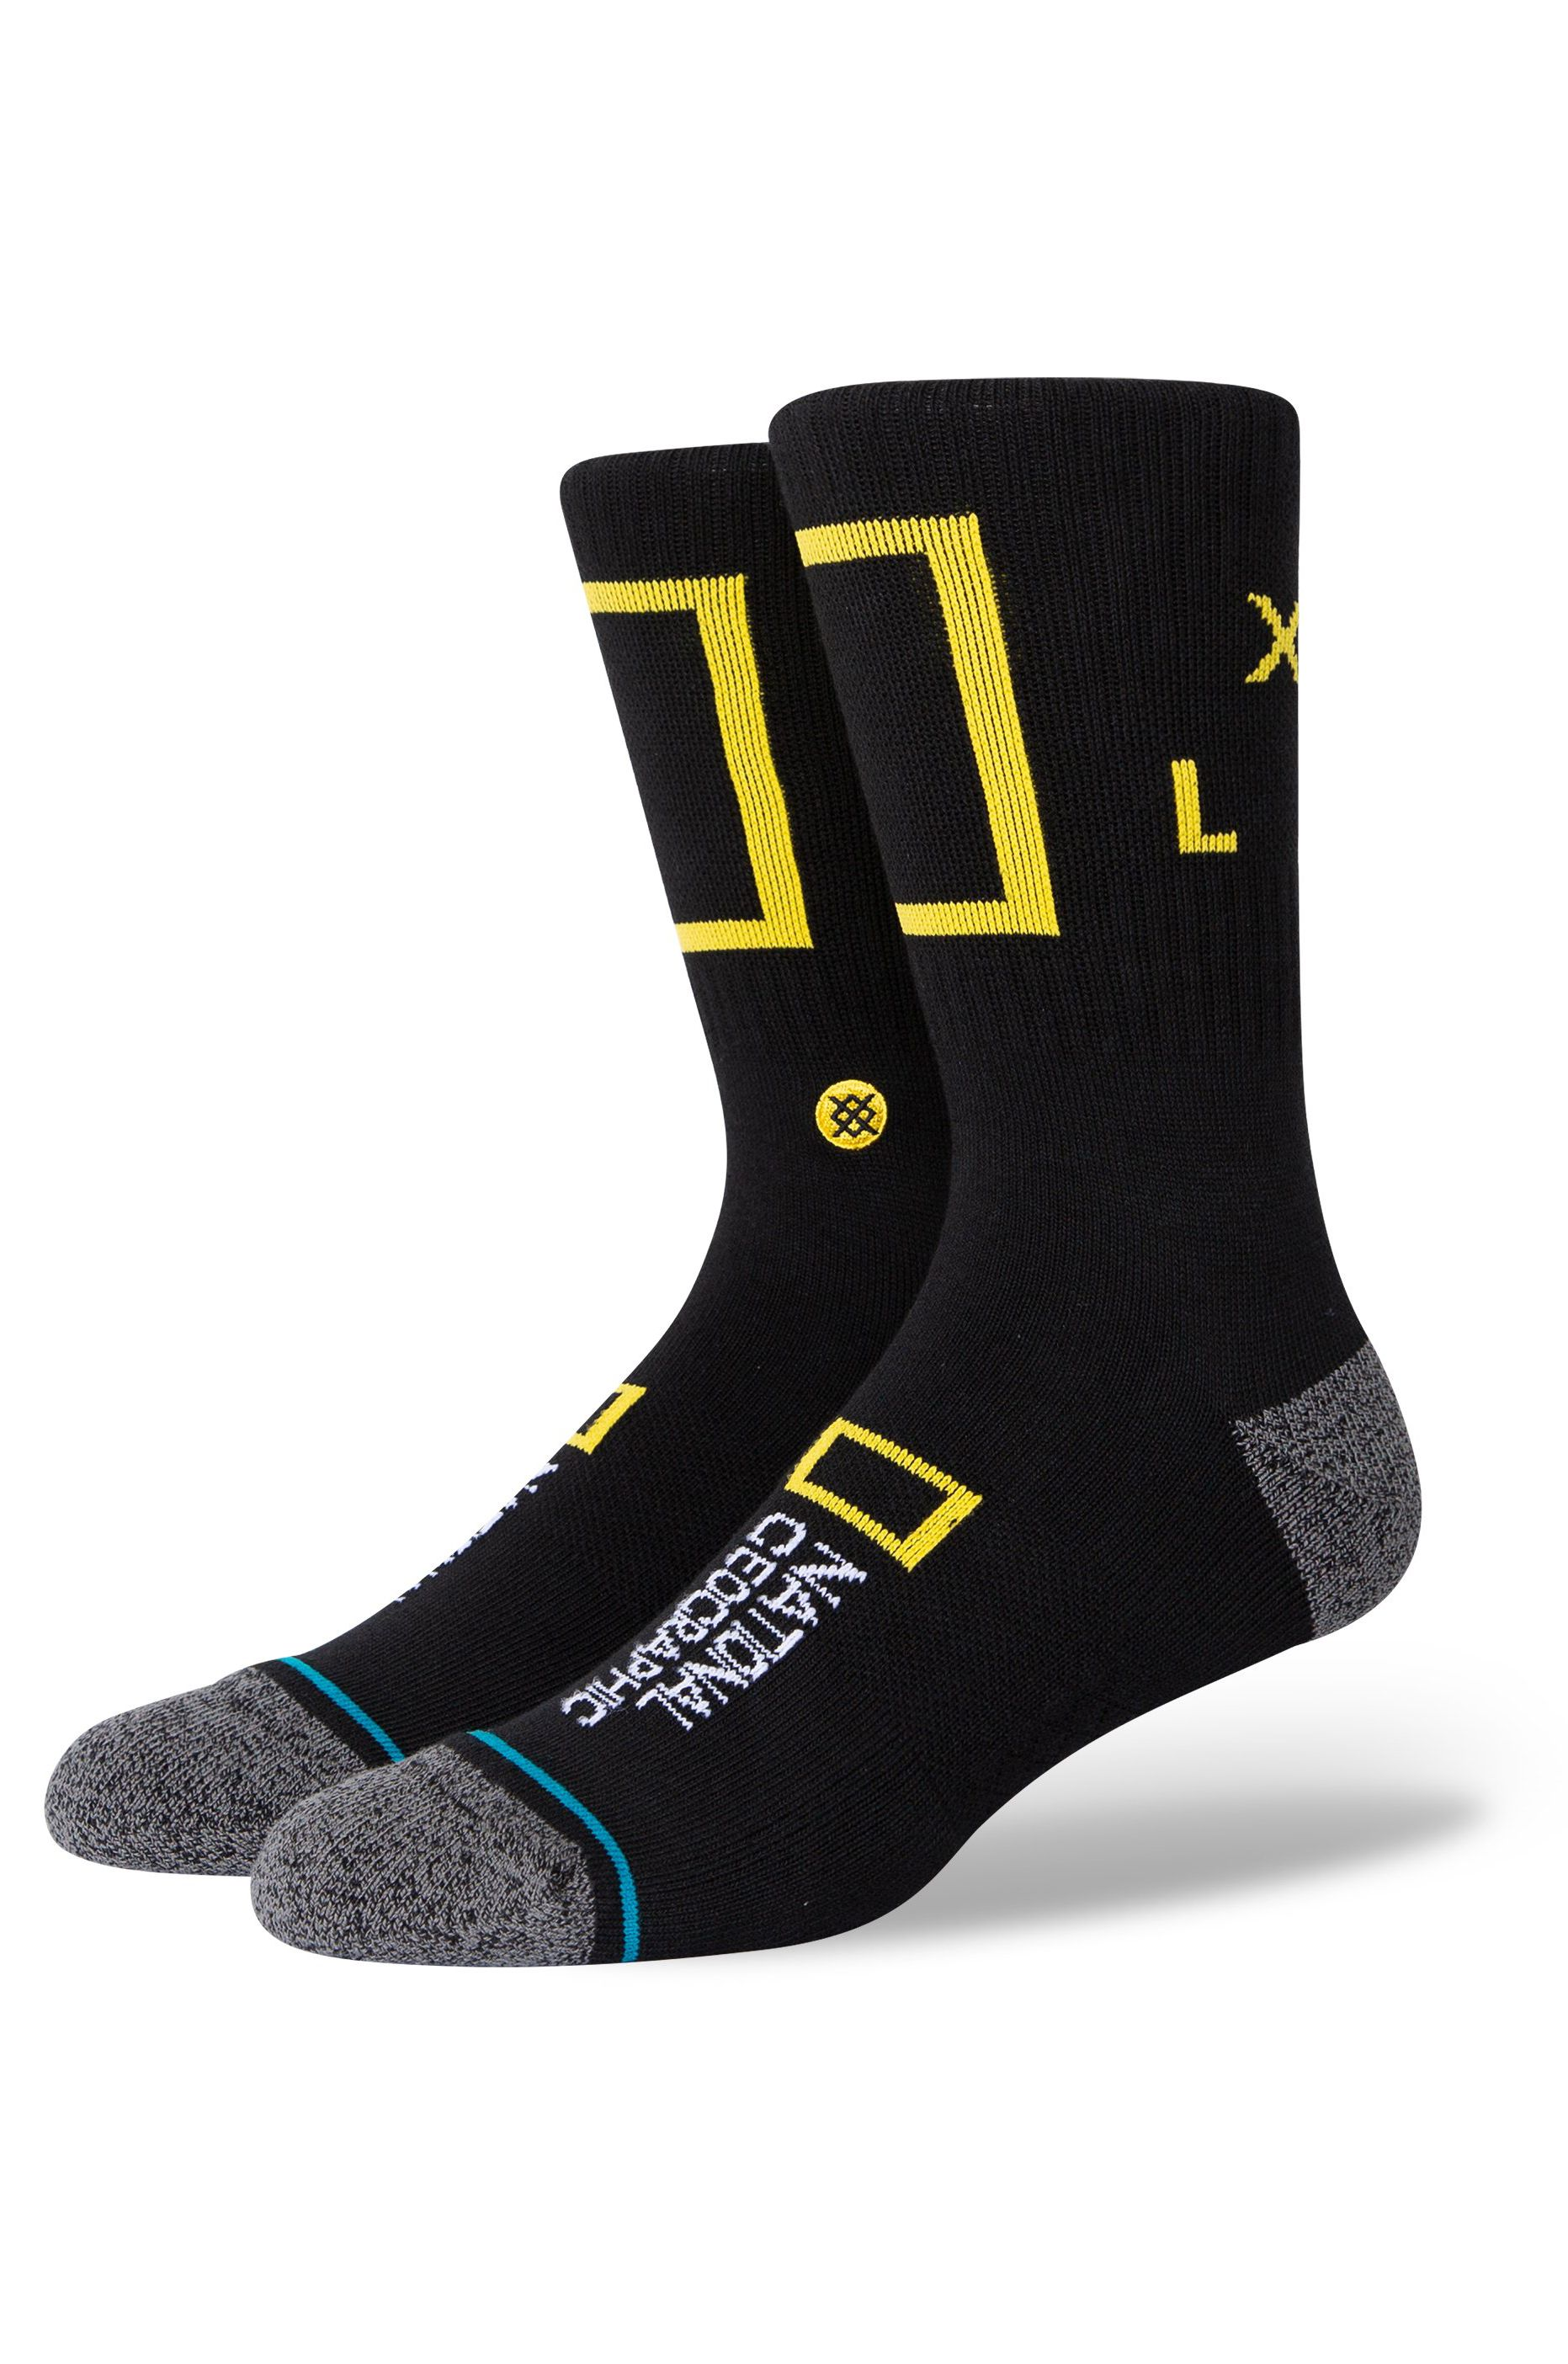 Stance Socks EXPLORE ARROW Black